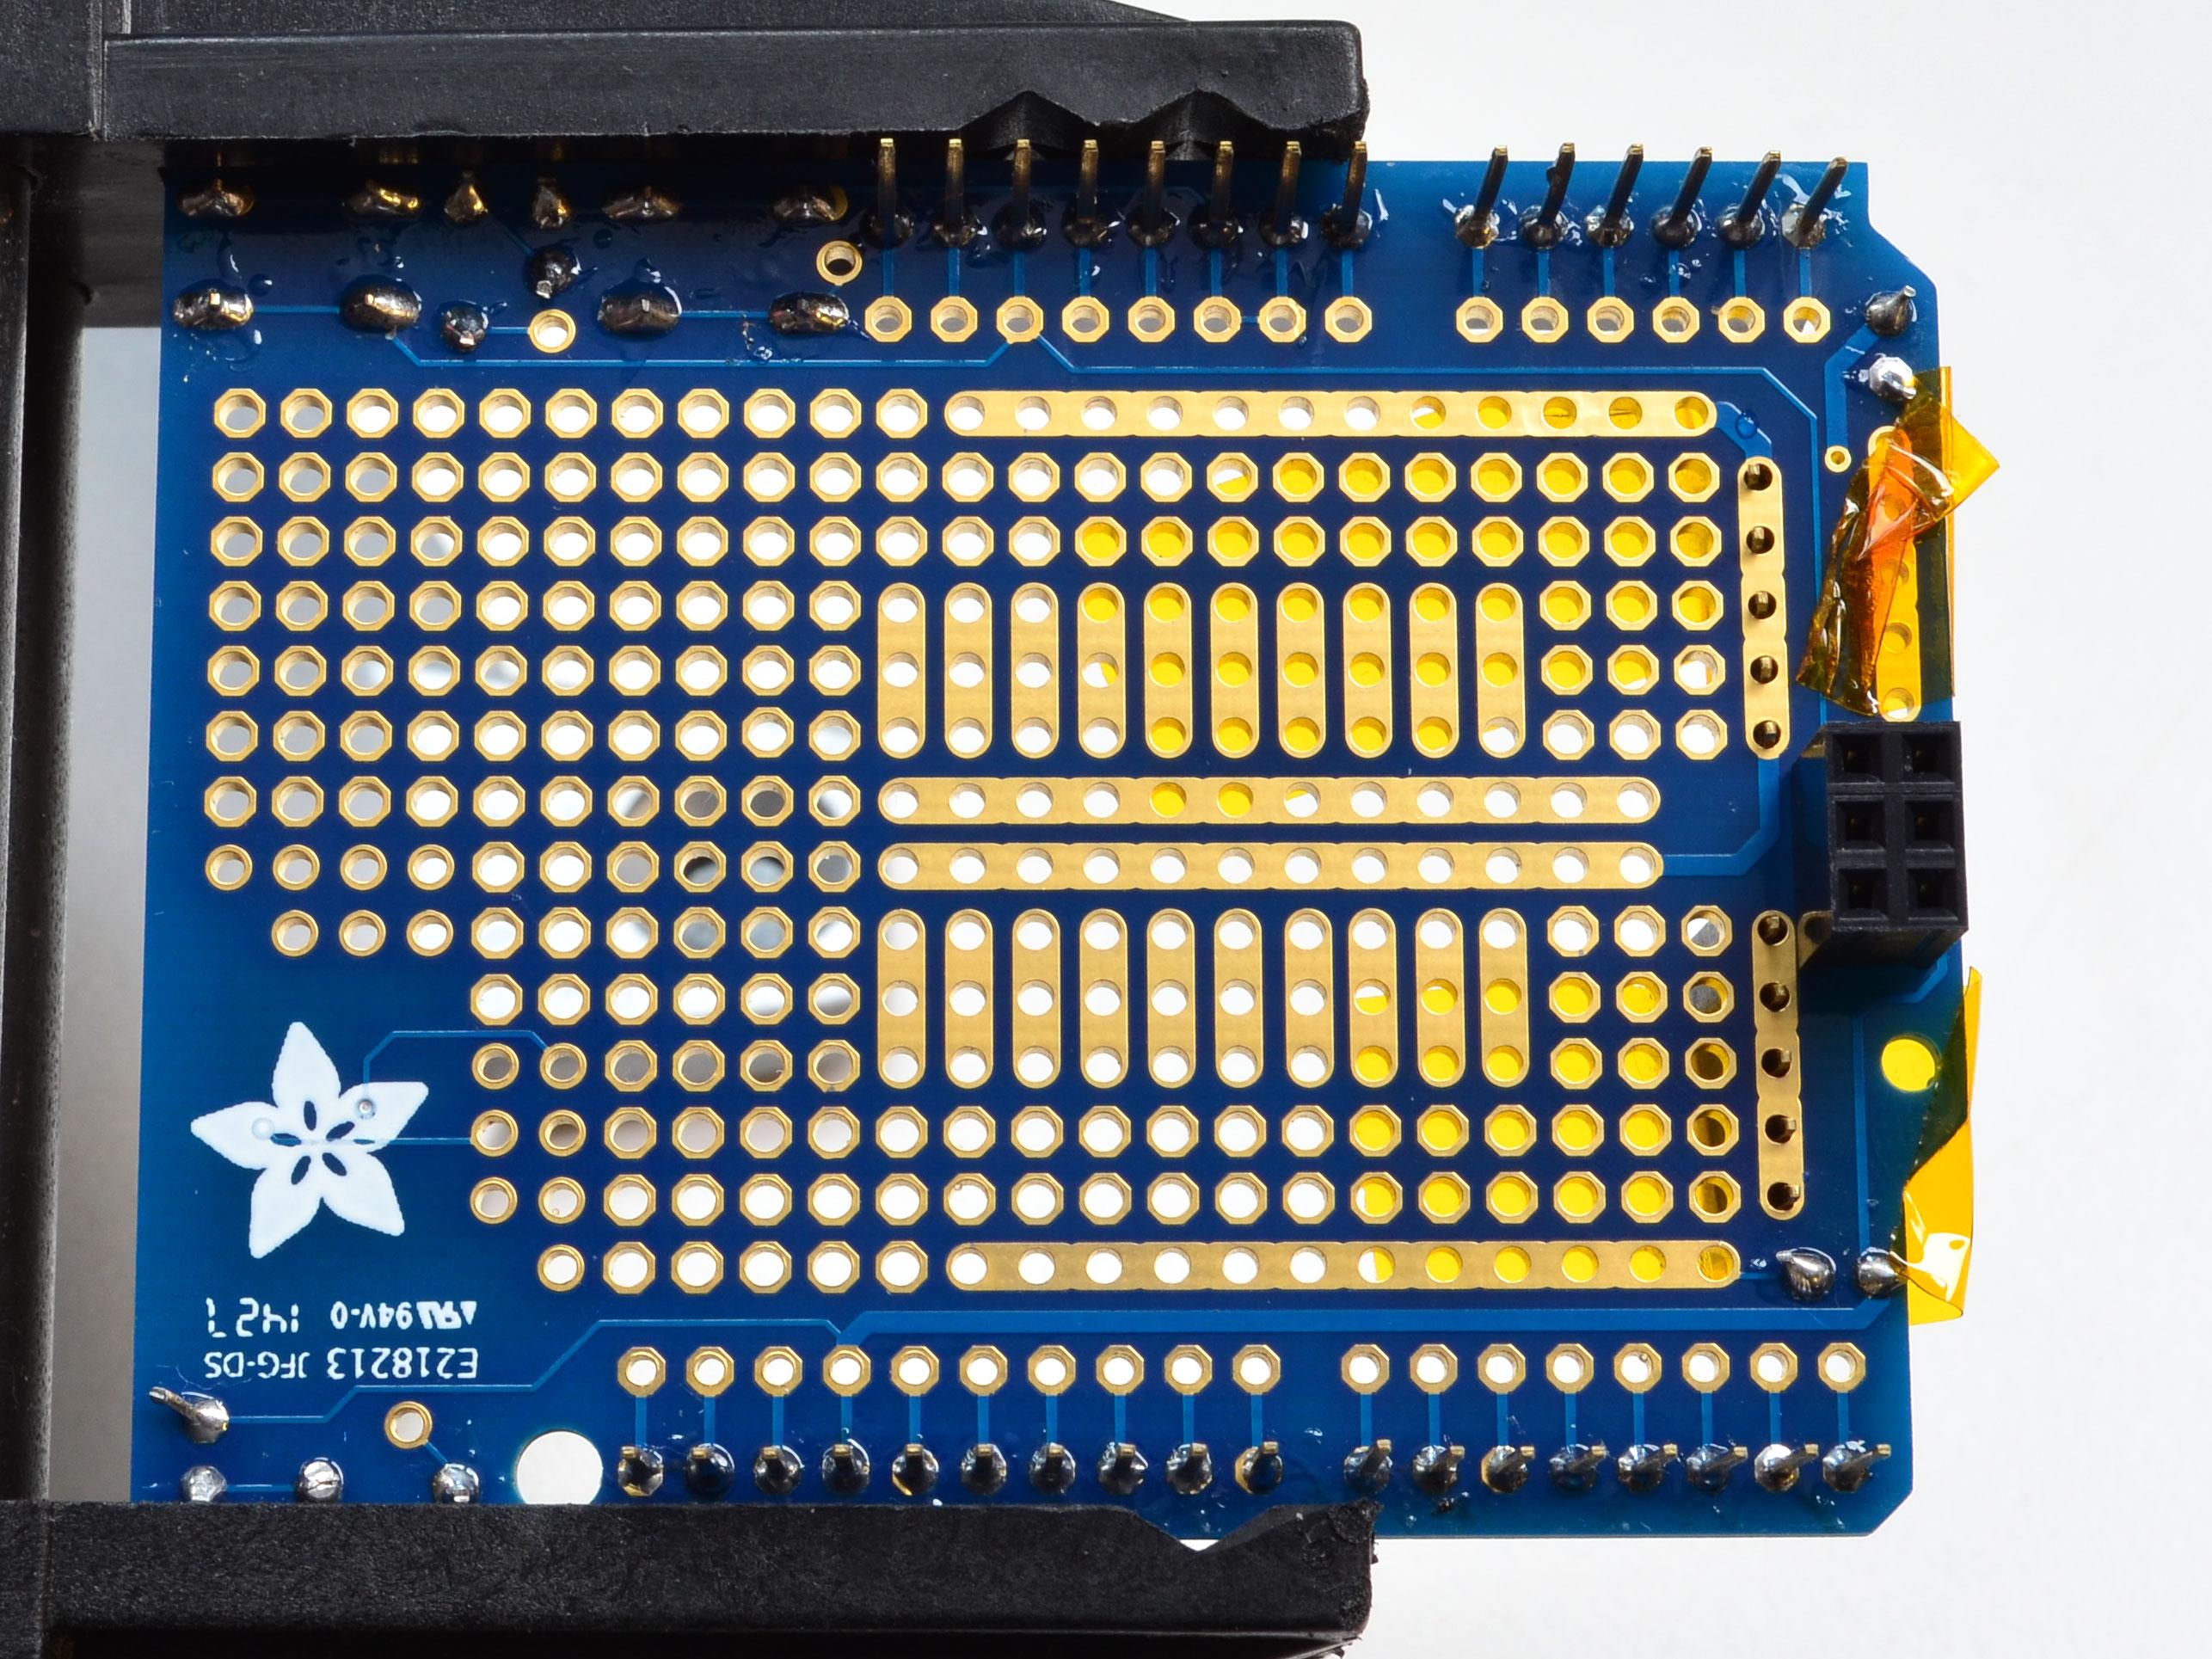 A000077 Arduino Proto Shield Rev3 assembled Arduino